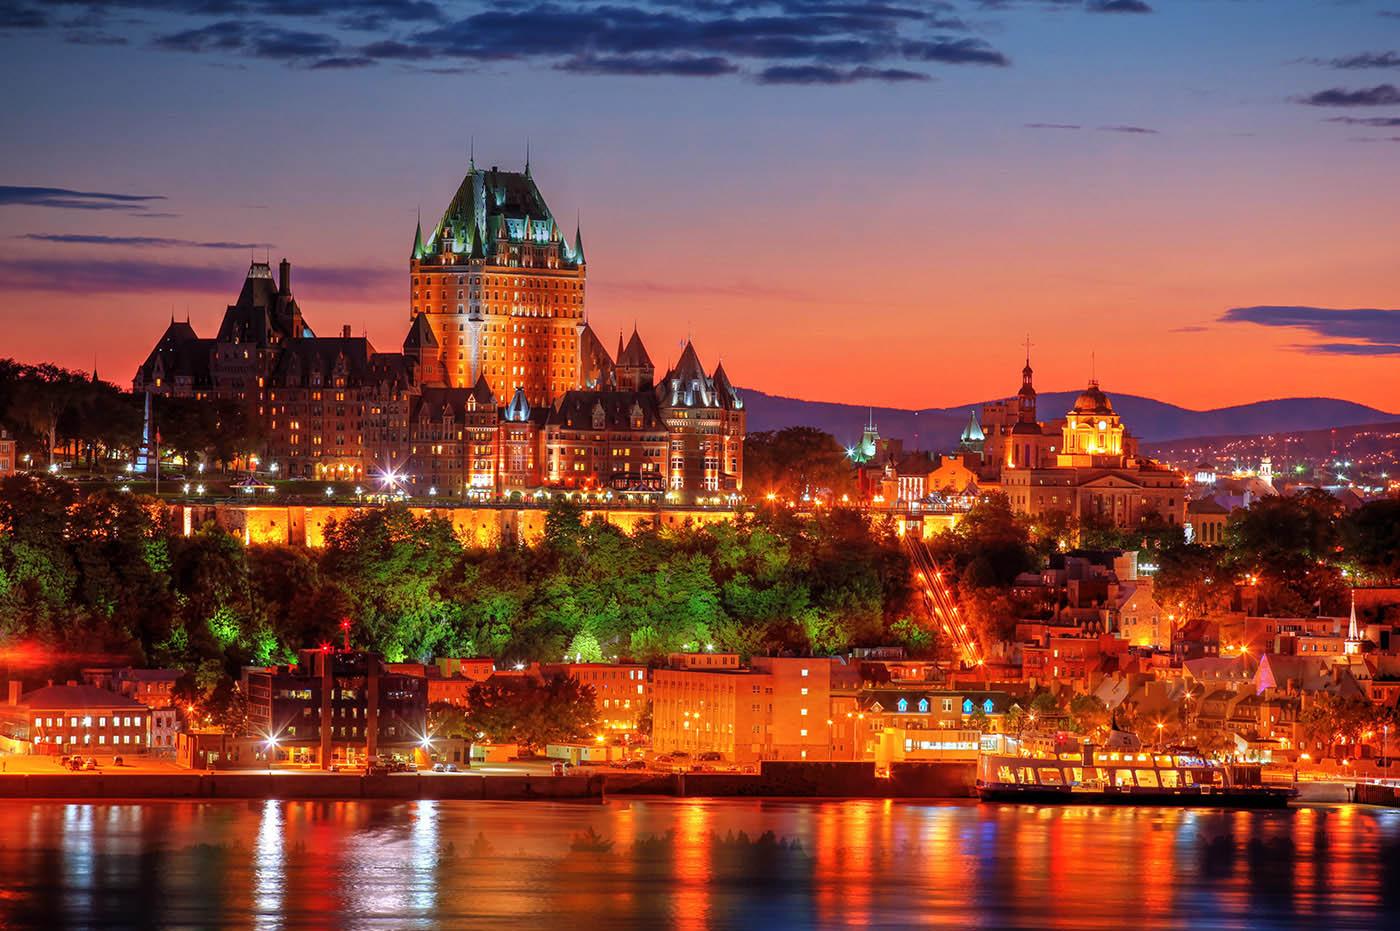 Quebec Frontenac Castle Montage 02 - Colorful Stock Photos